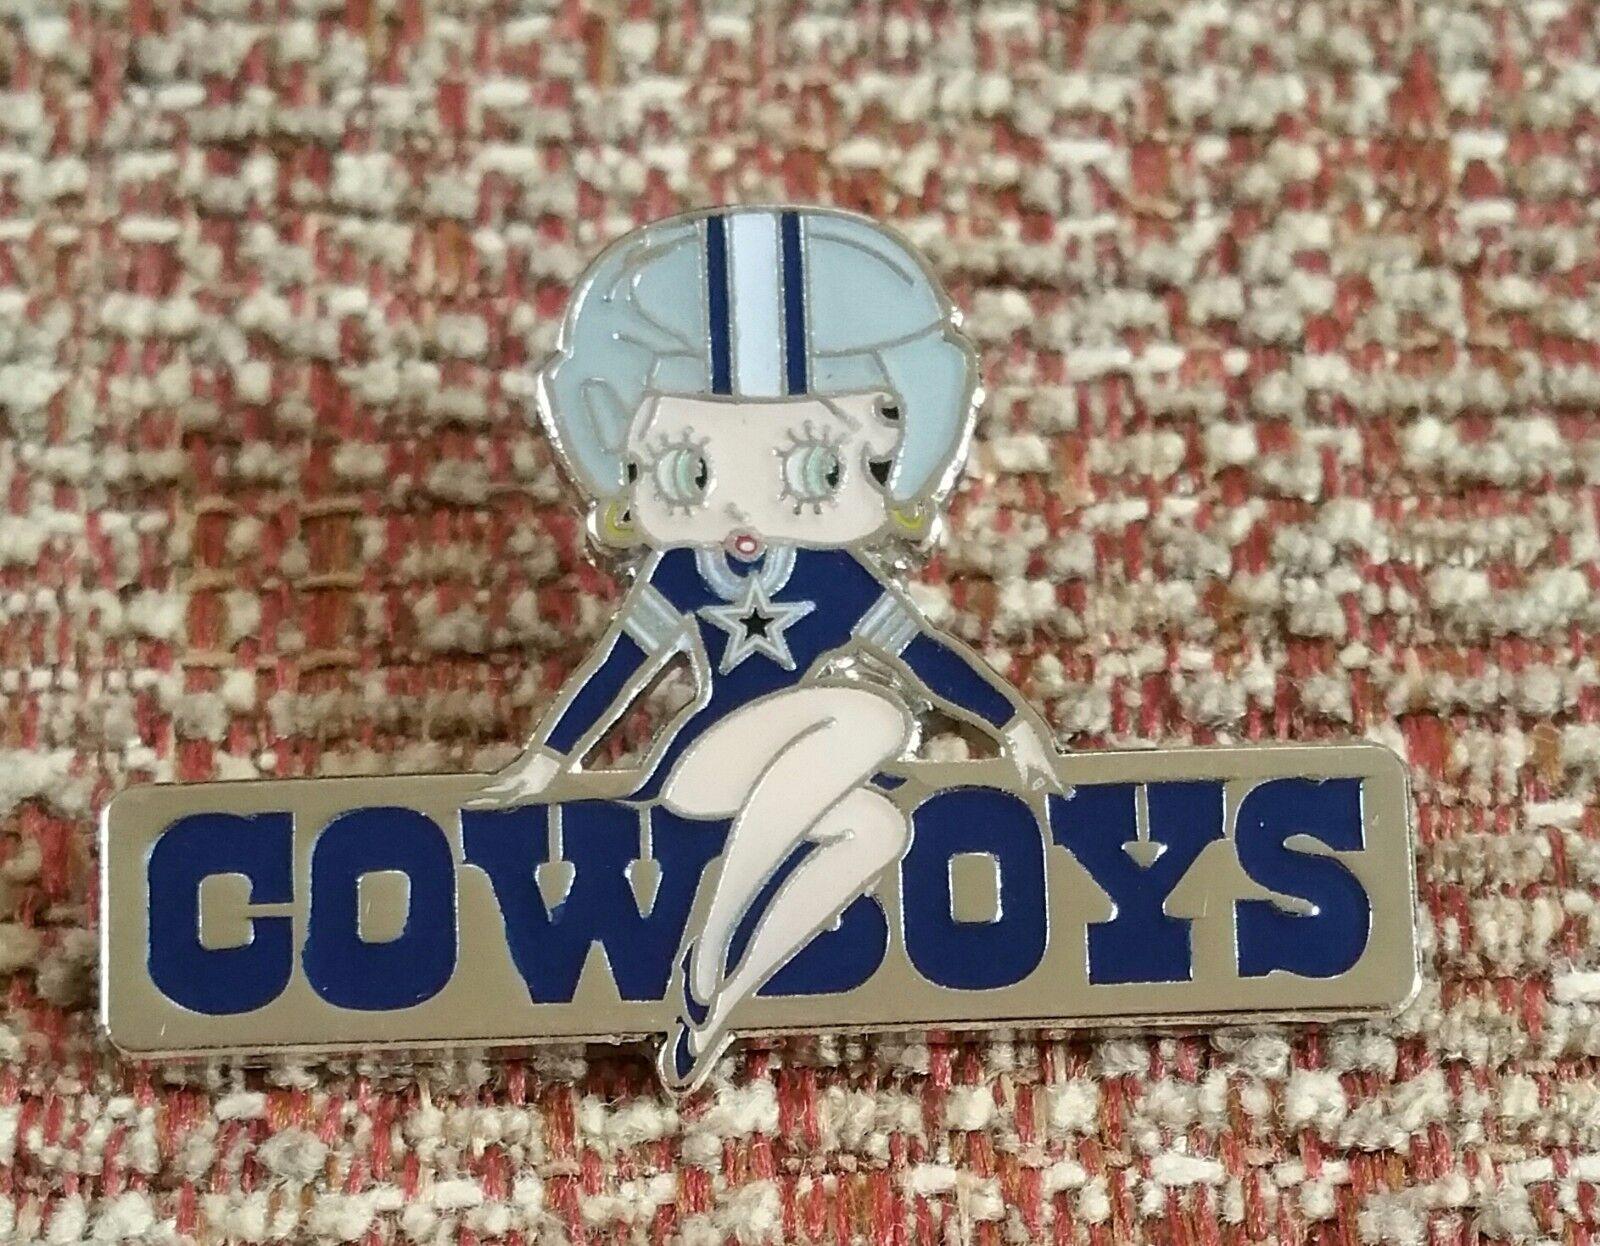 Football nfl fan apparel souvenirs sports mem cards fan shop dallas cowboys betty boop lapel pin kristyandbryce Choice Image